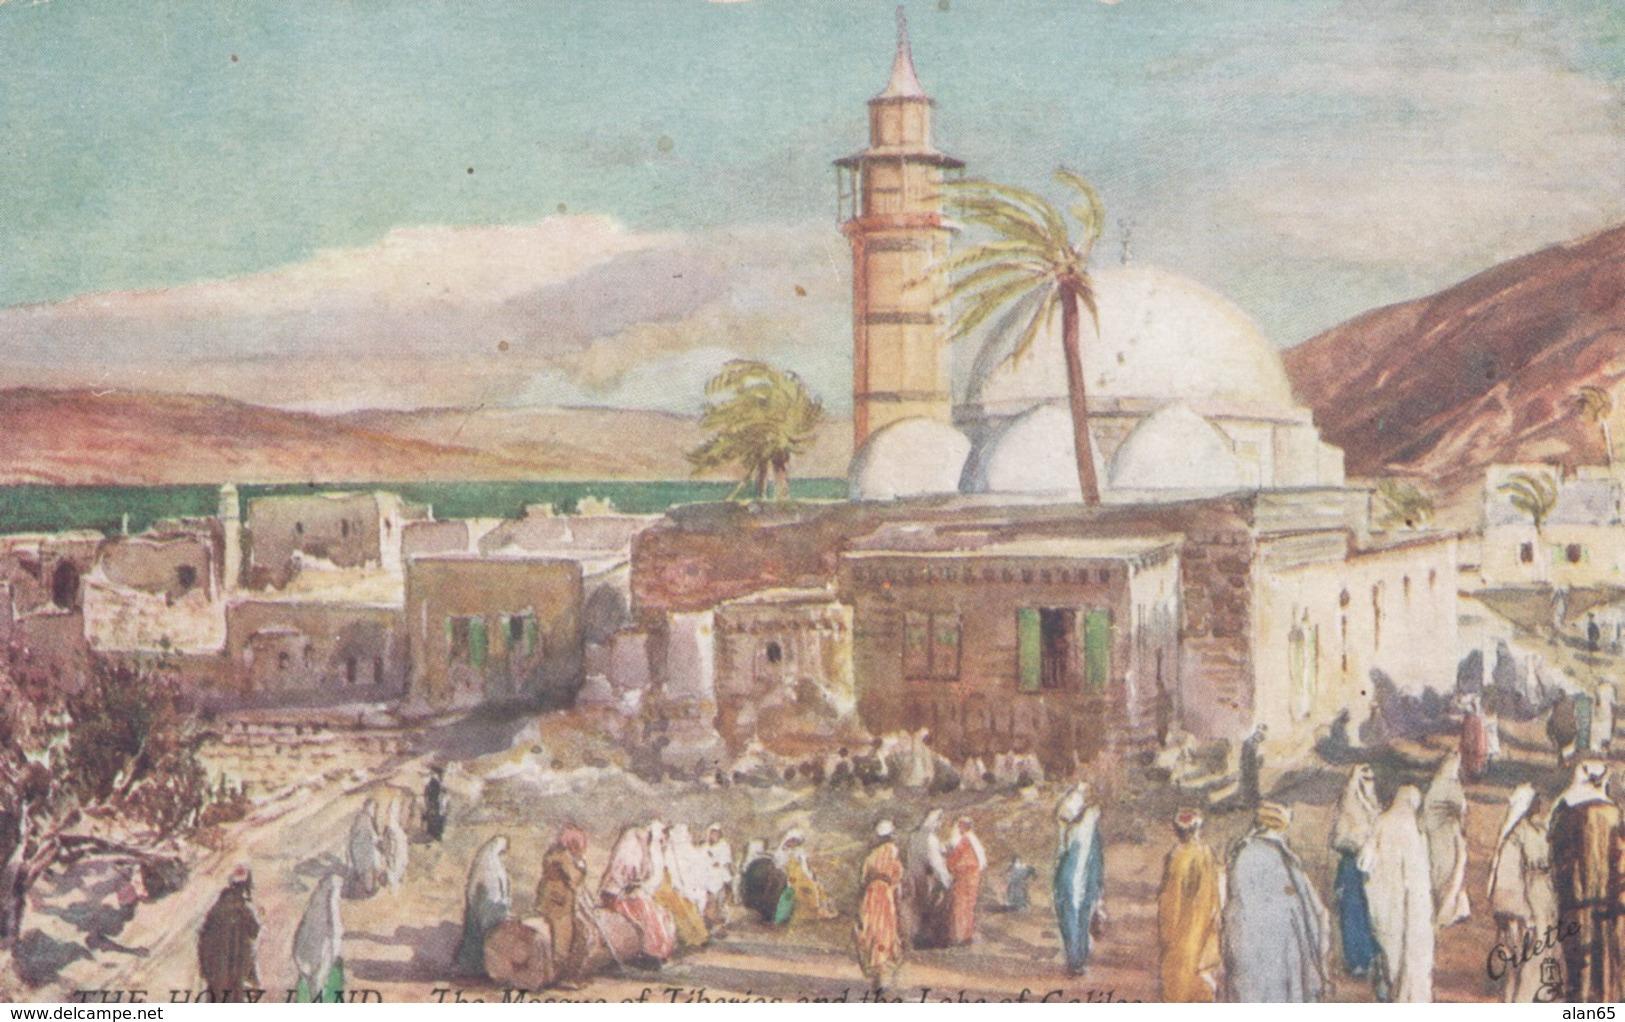 Tiberias Israel, The Mosque Of Tiberias And Lake Of Galilee, 1900s/10s Vintage Tuck Holy Land Series III #7310 Postcard - Israel